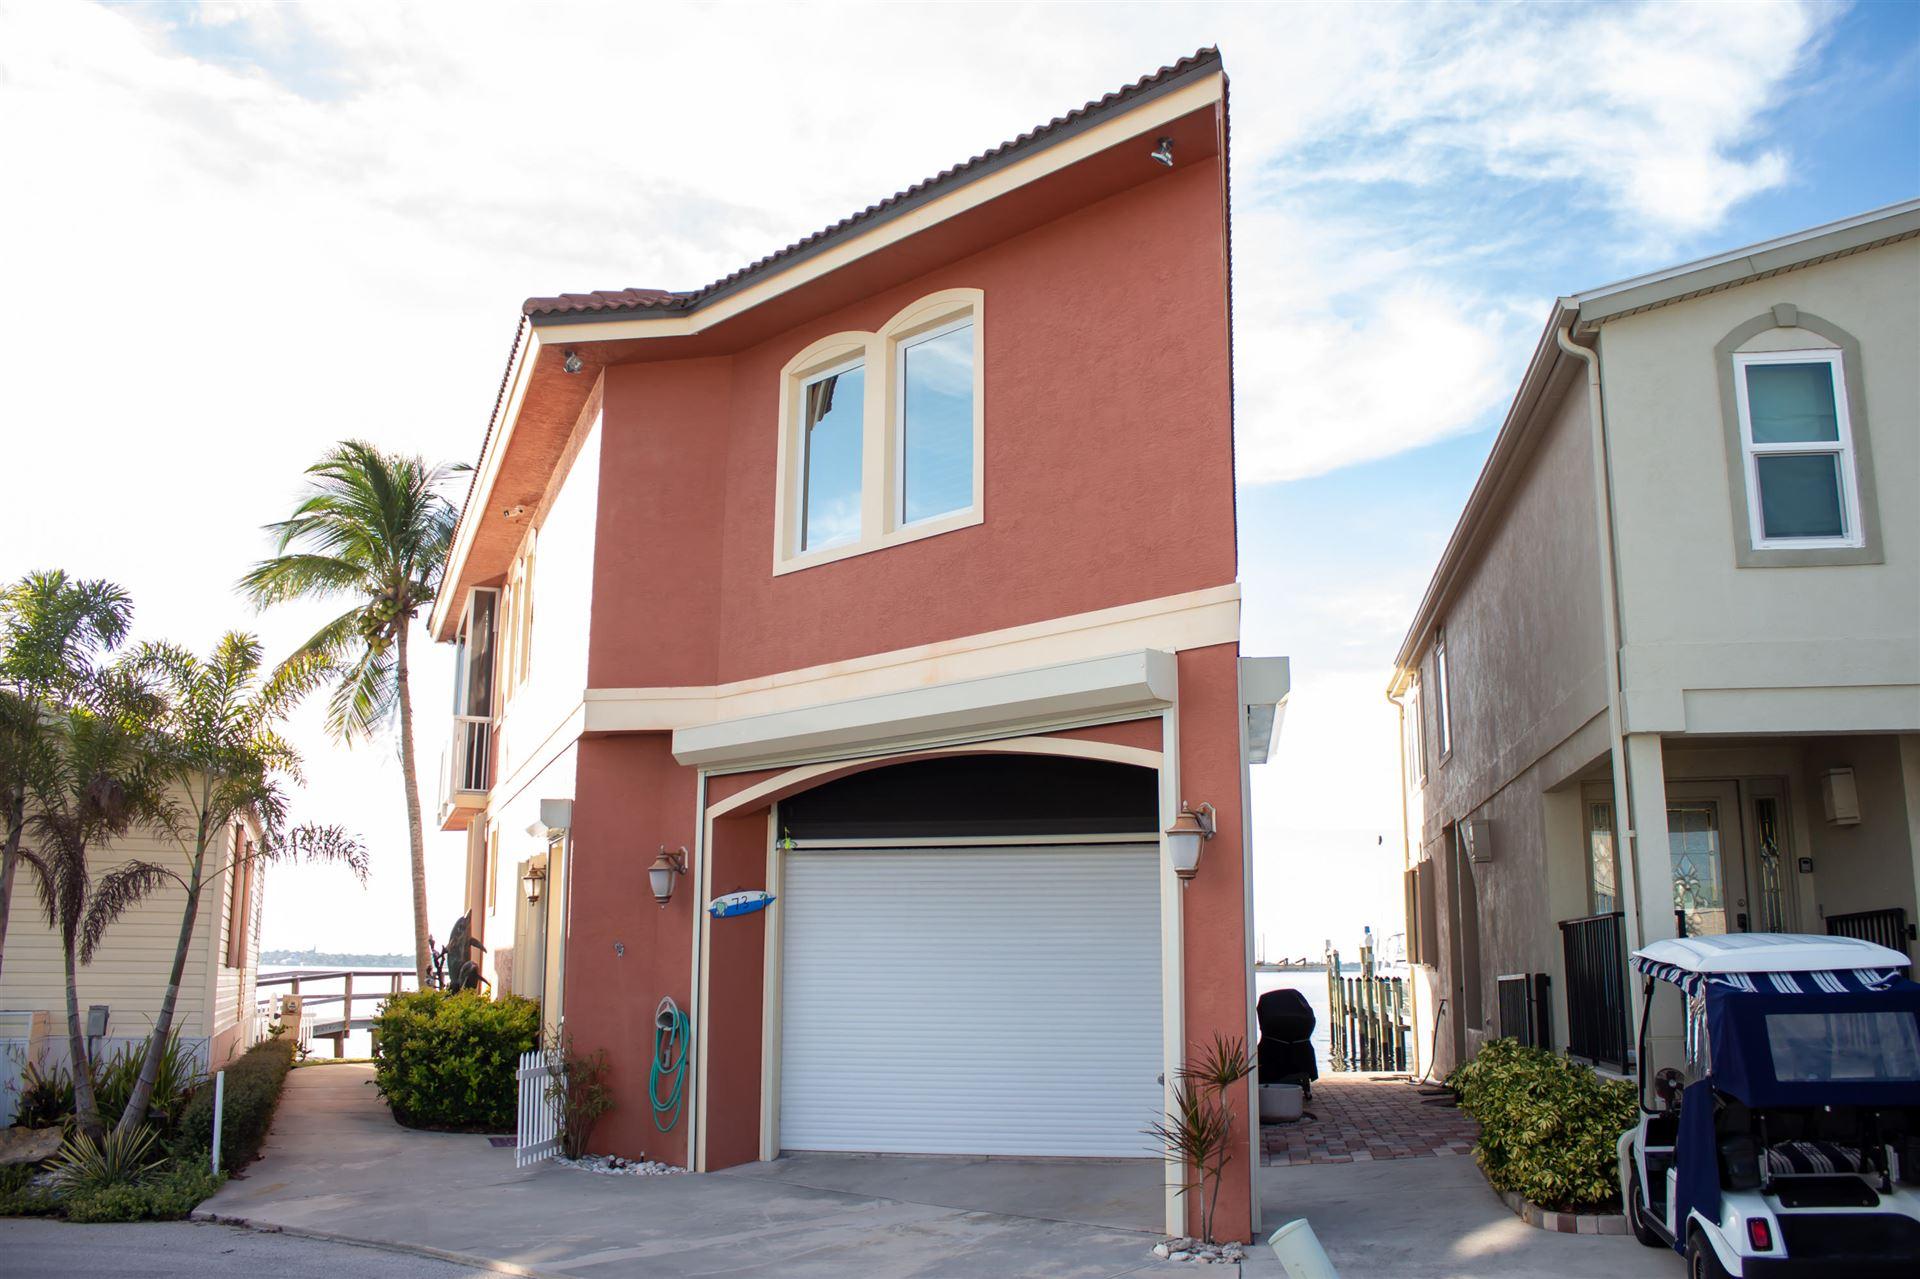 10851 S Ocean 73 Drive, Jensen Beach, FL 34957 - #: RX-10679292